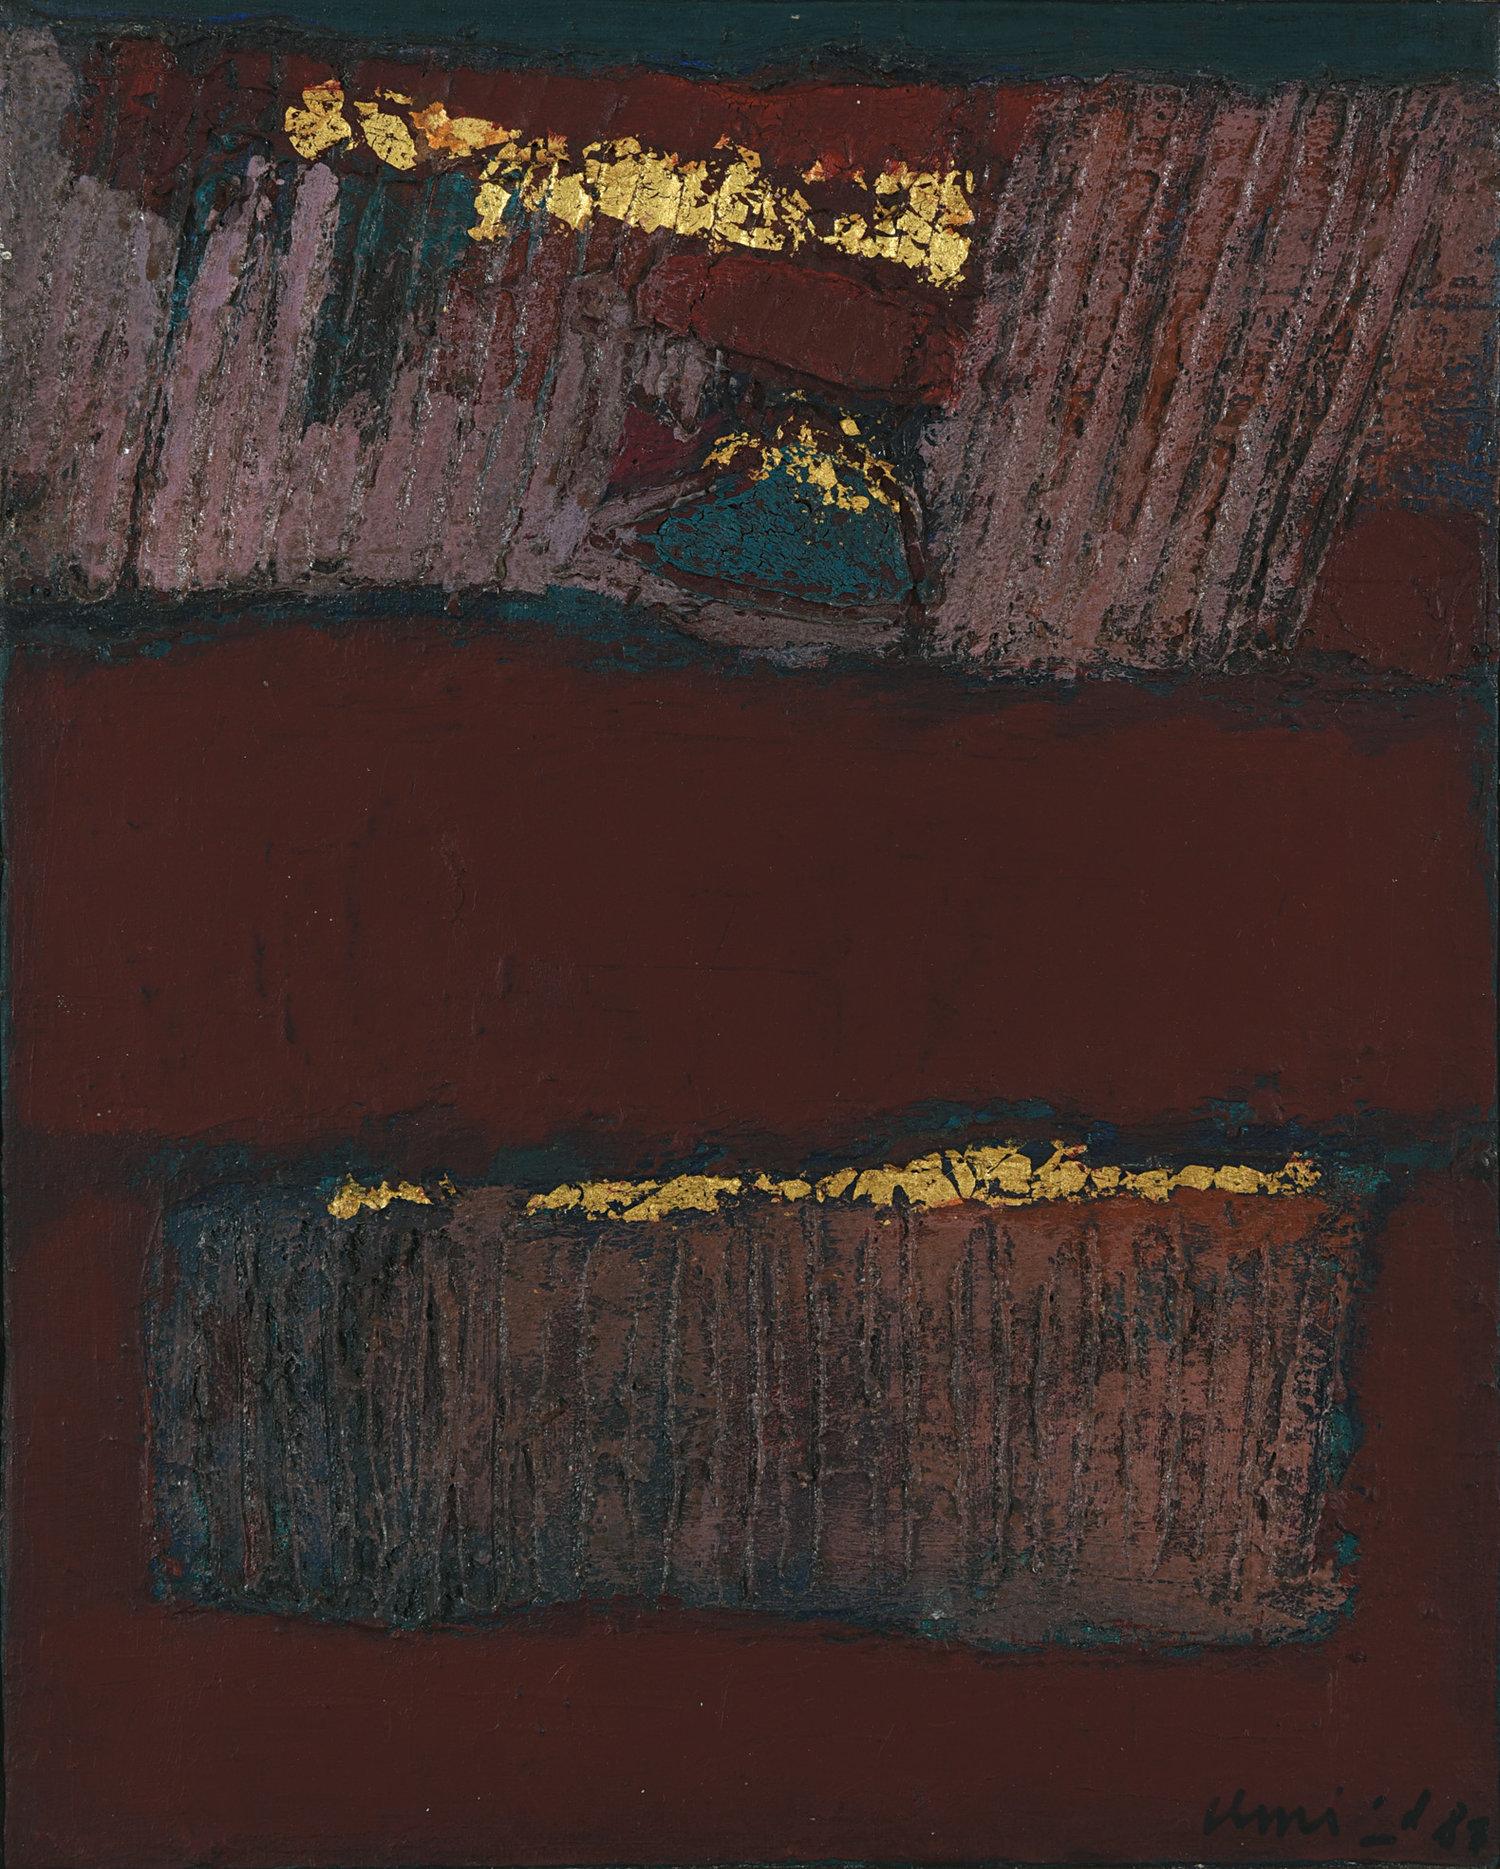 Umi Dachlan, Untitled, mixed media on canvas, 30 x 24 cm, 1987